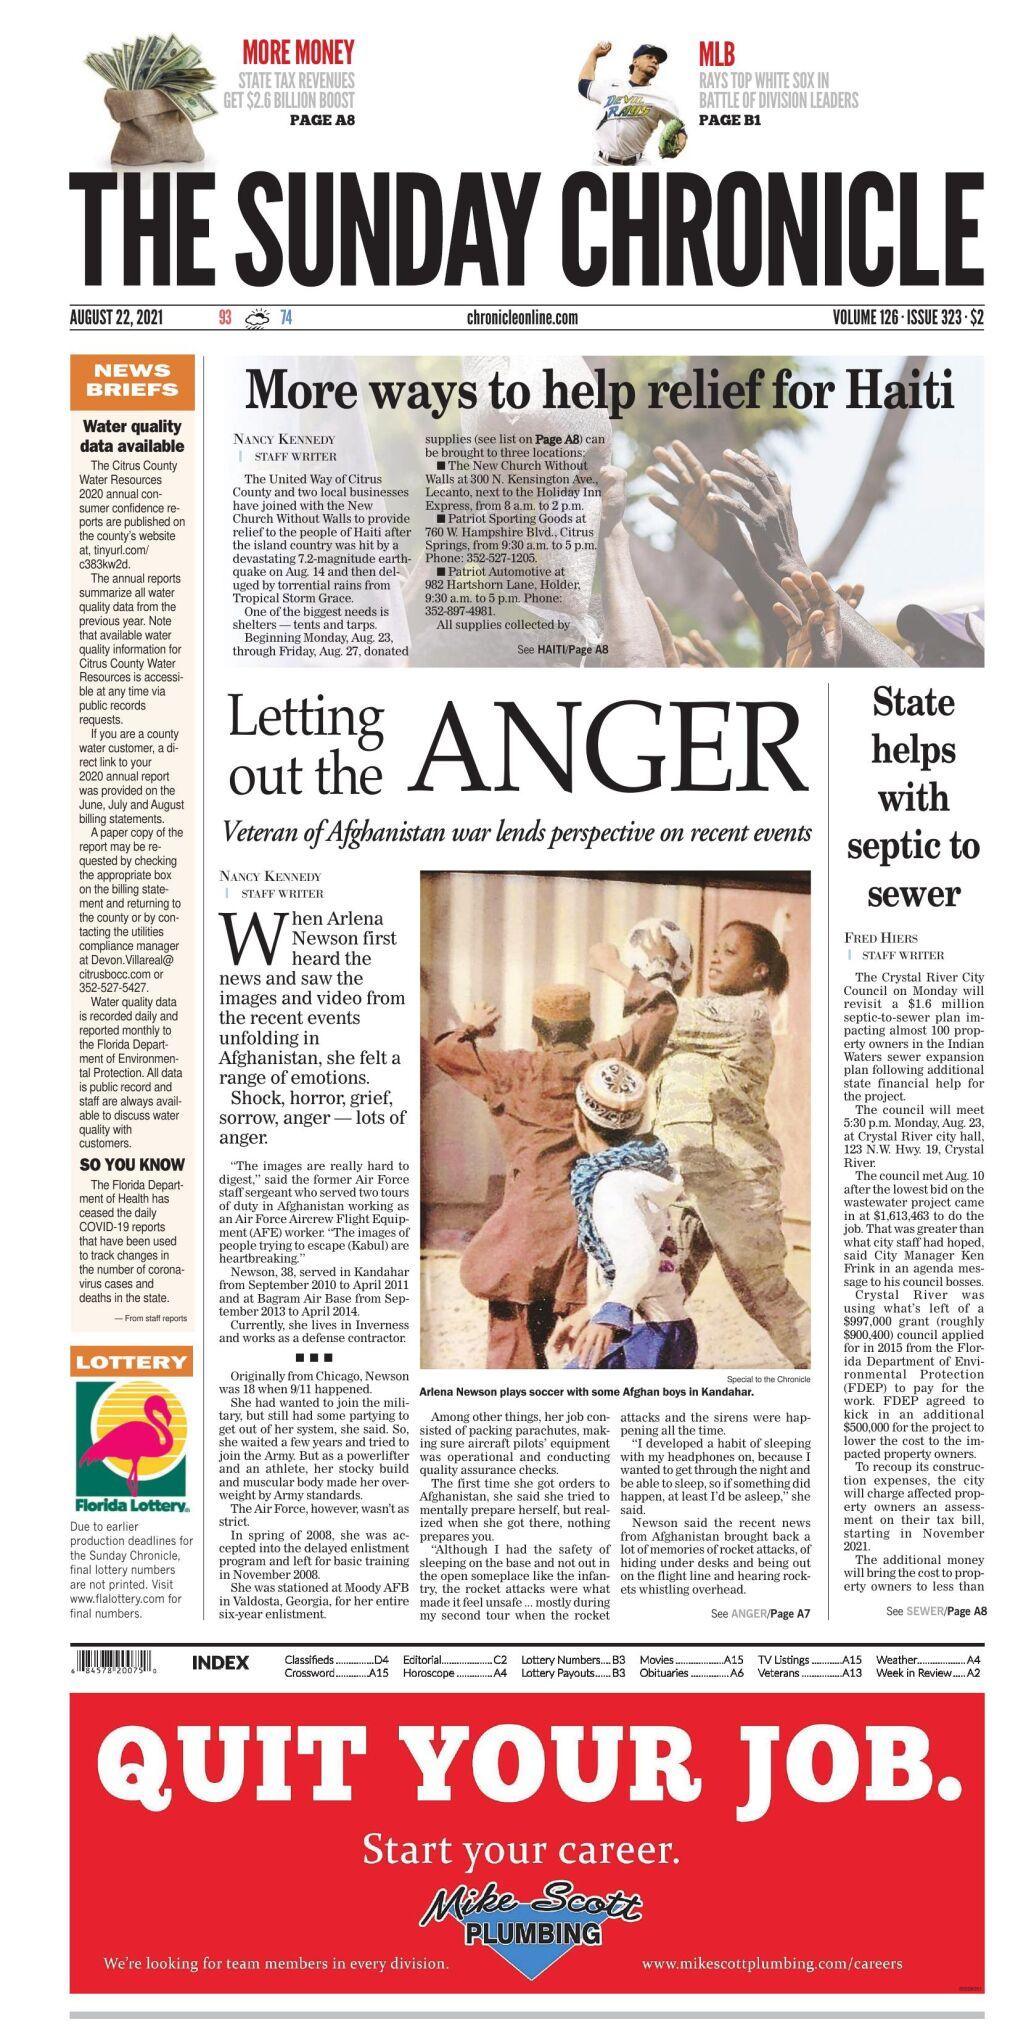 Citrus County Chronicle e-edition Aug 22, 2021